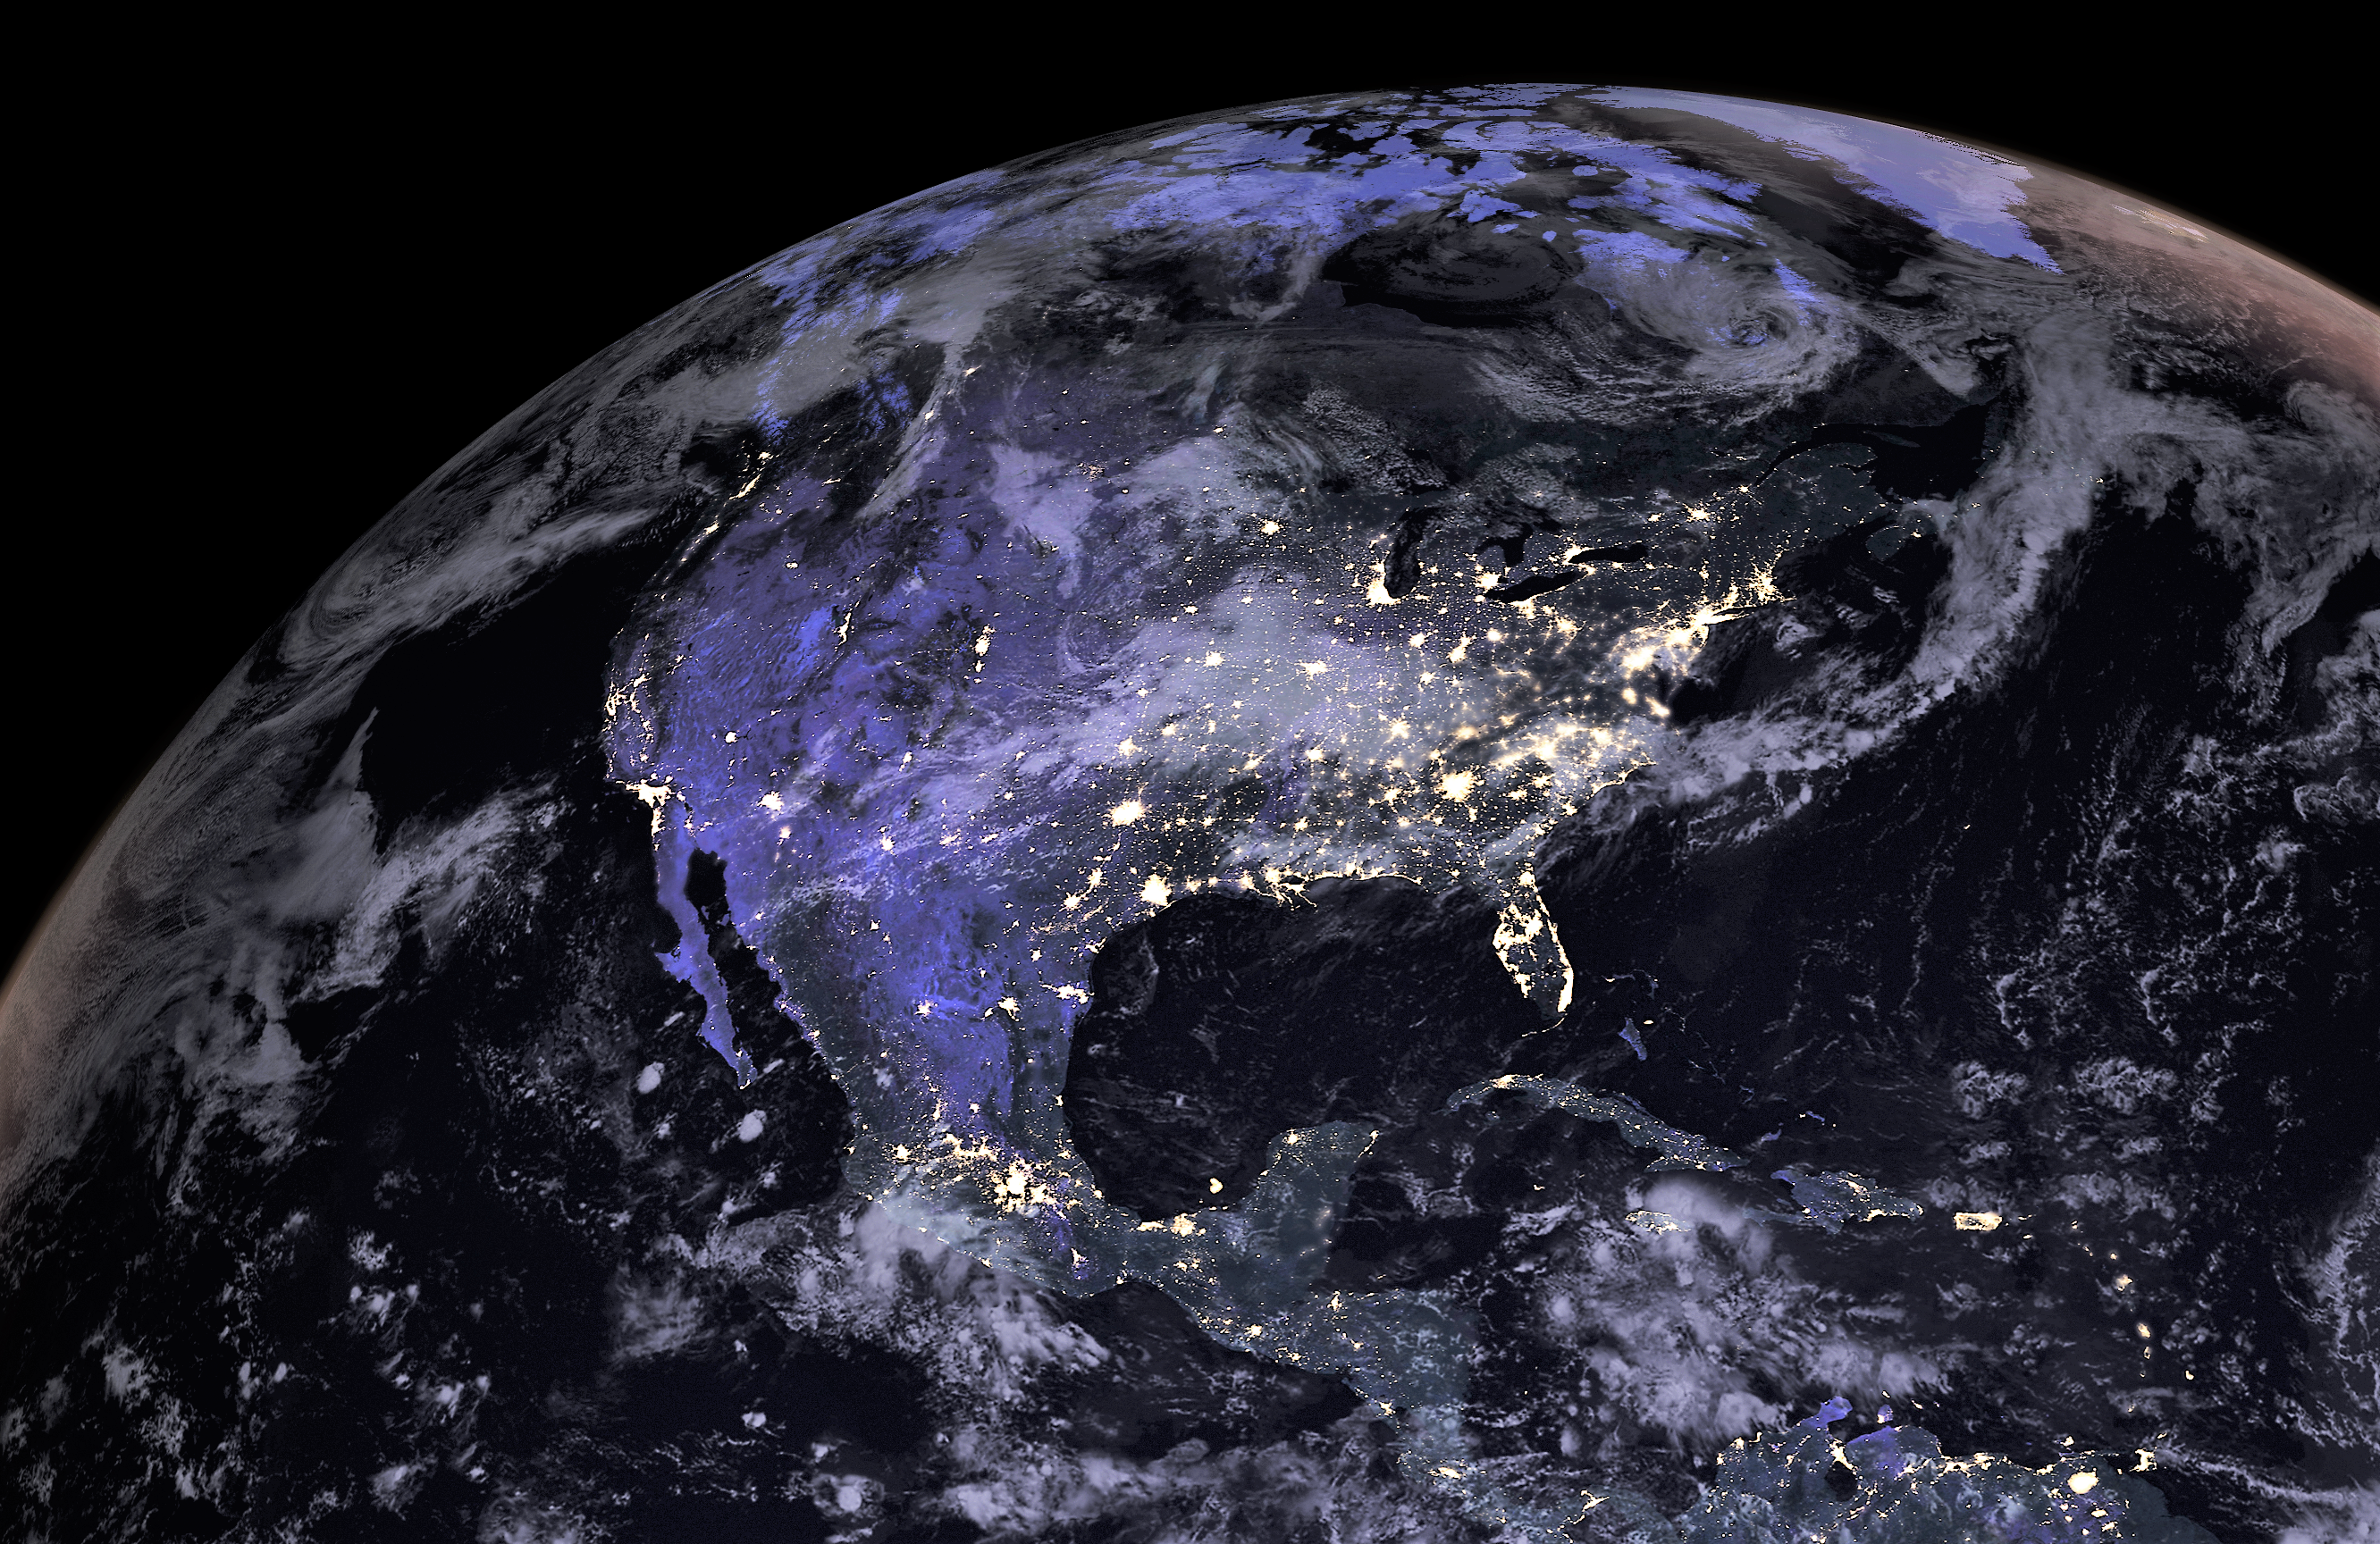 Amazon's Project Kuiper aims to offer satellite broadband access ...